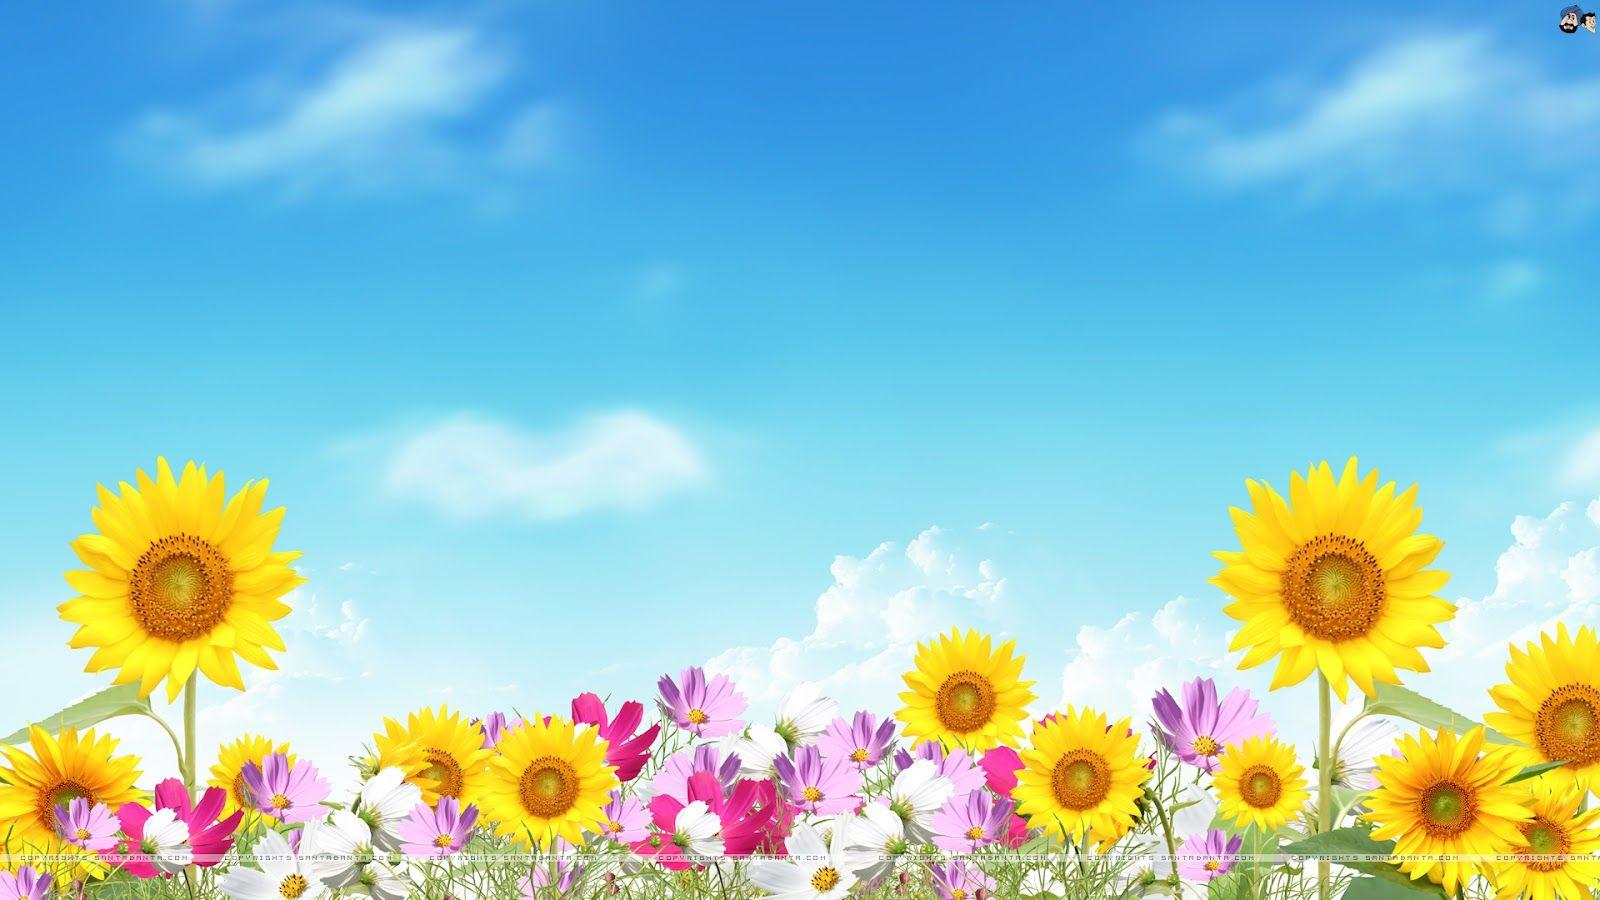 Aaaaaaaaoqa G6fo65msjpe S1600 Free Summer For Desktop Wallpaper 4 Jpg Flower Pictures Flower Backgrounds Summer Flowers